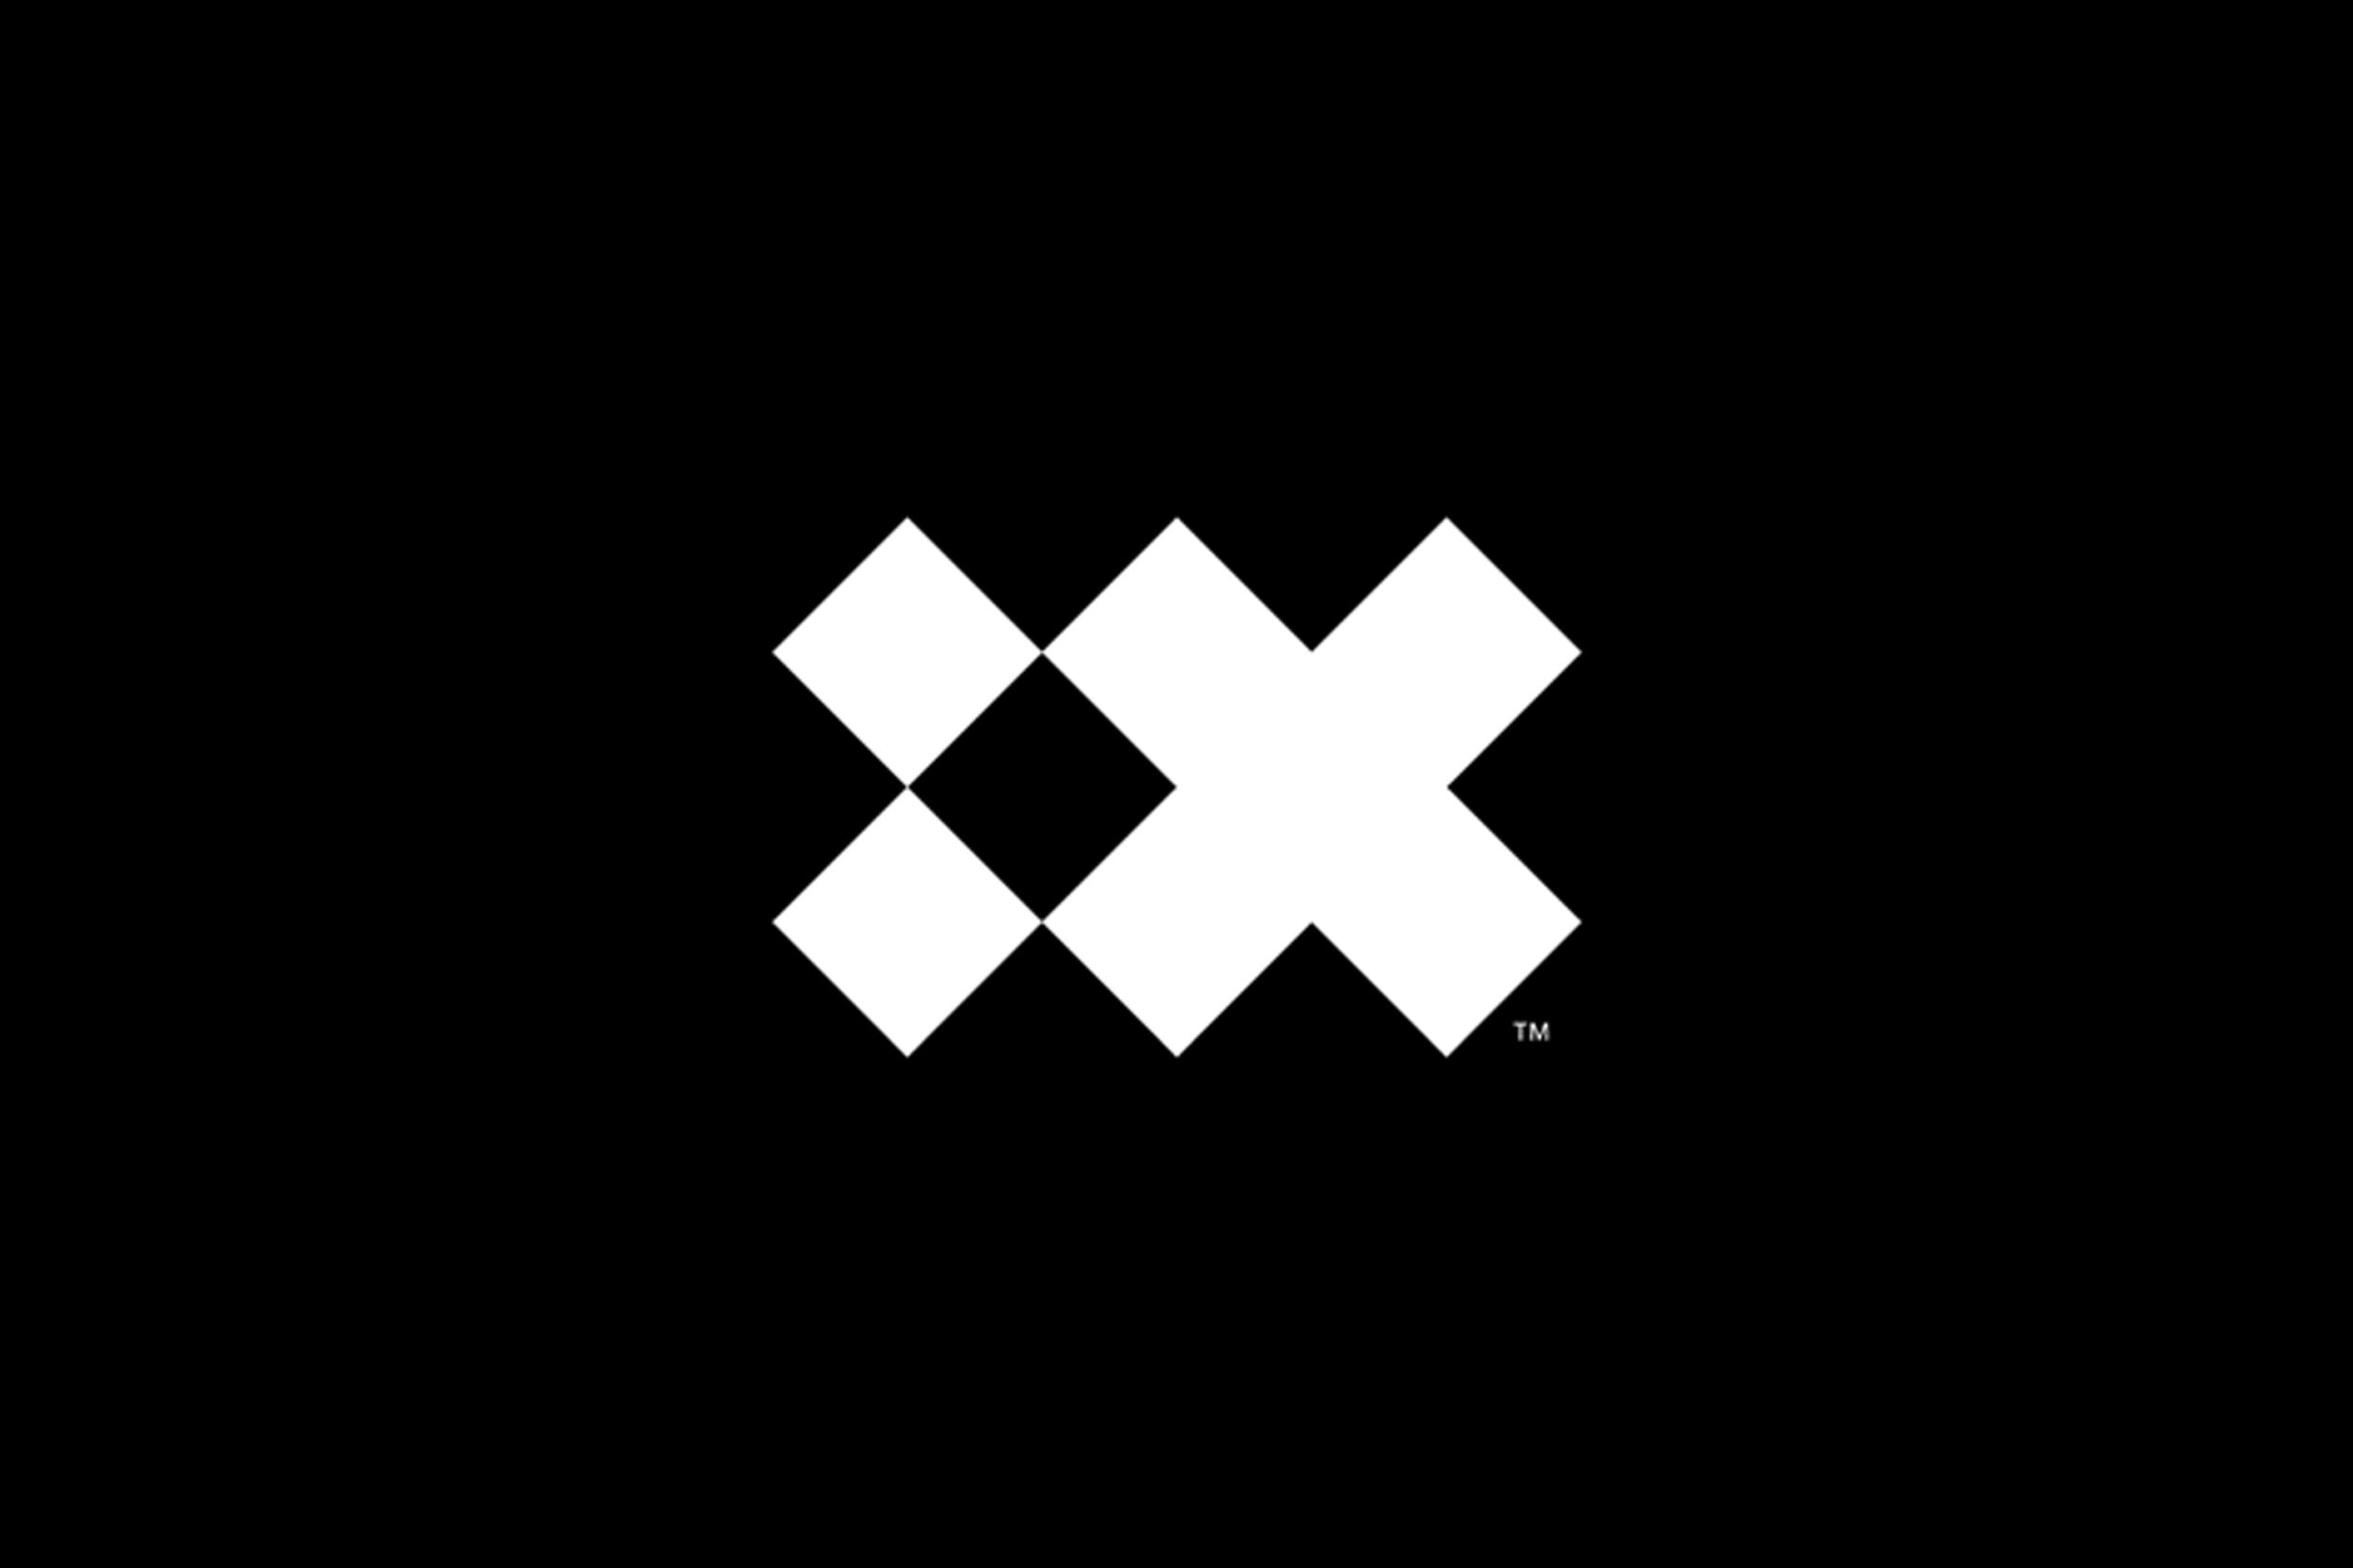 ix_logo.png